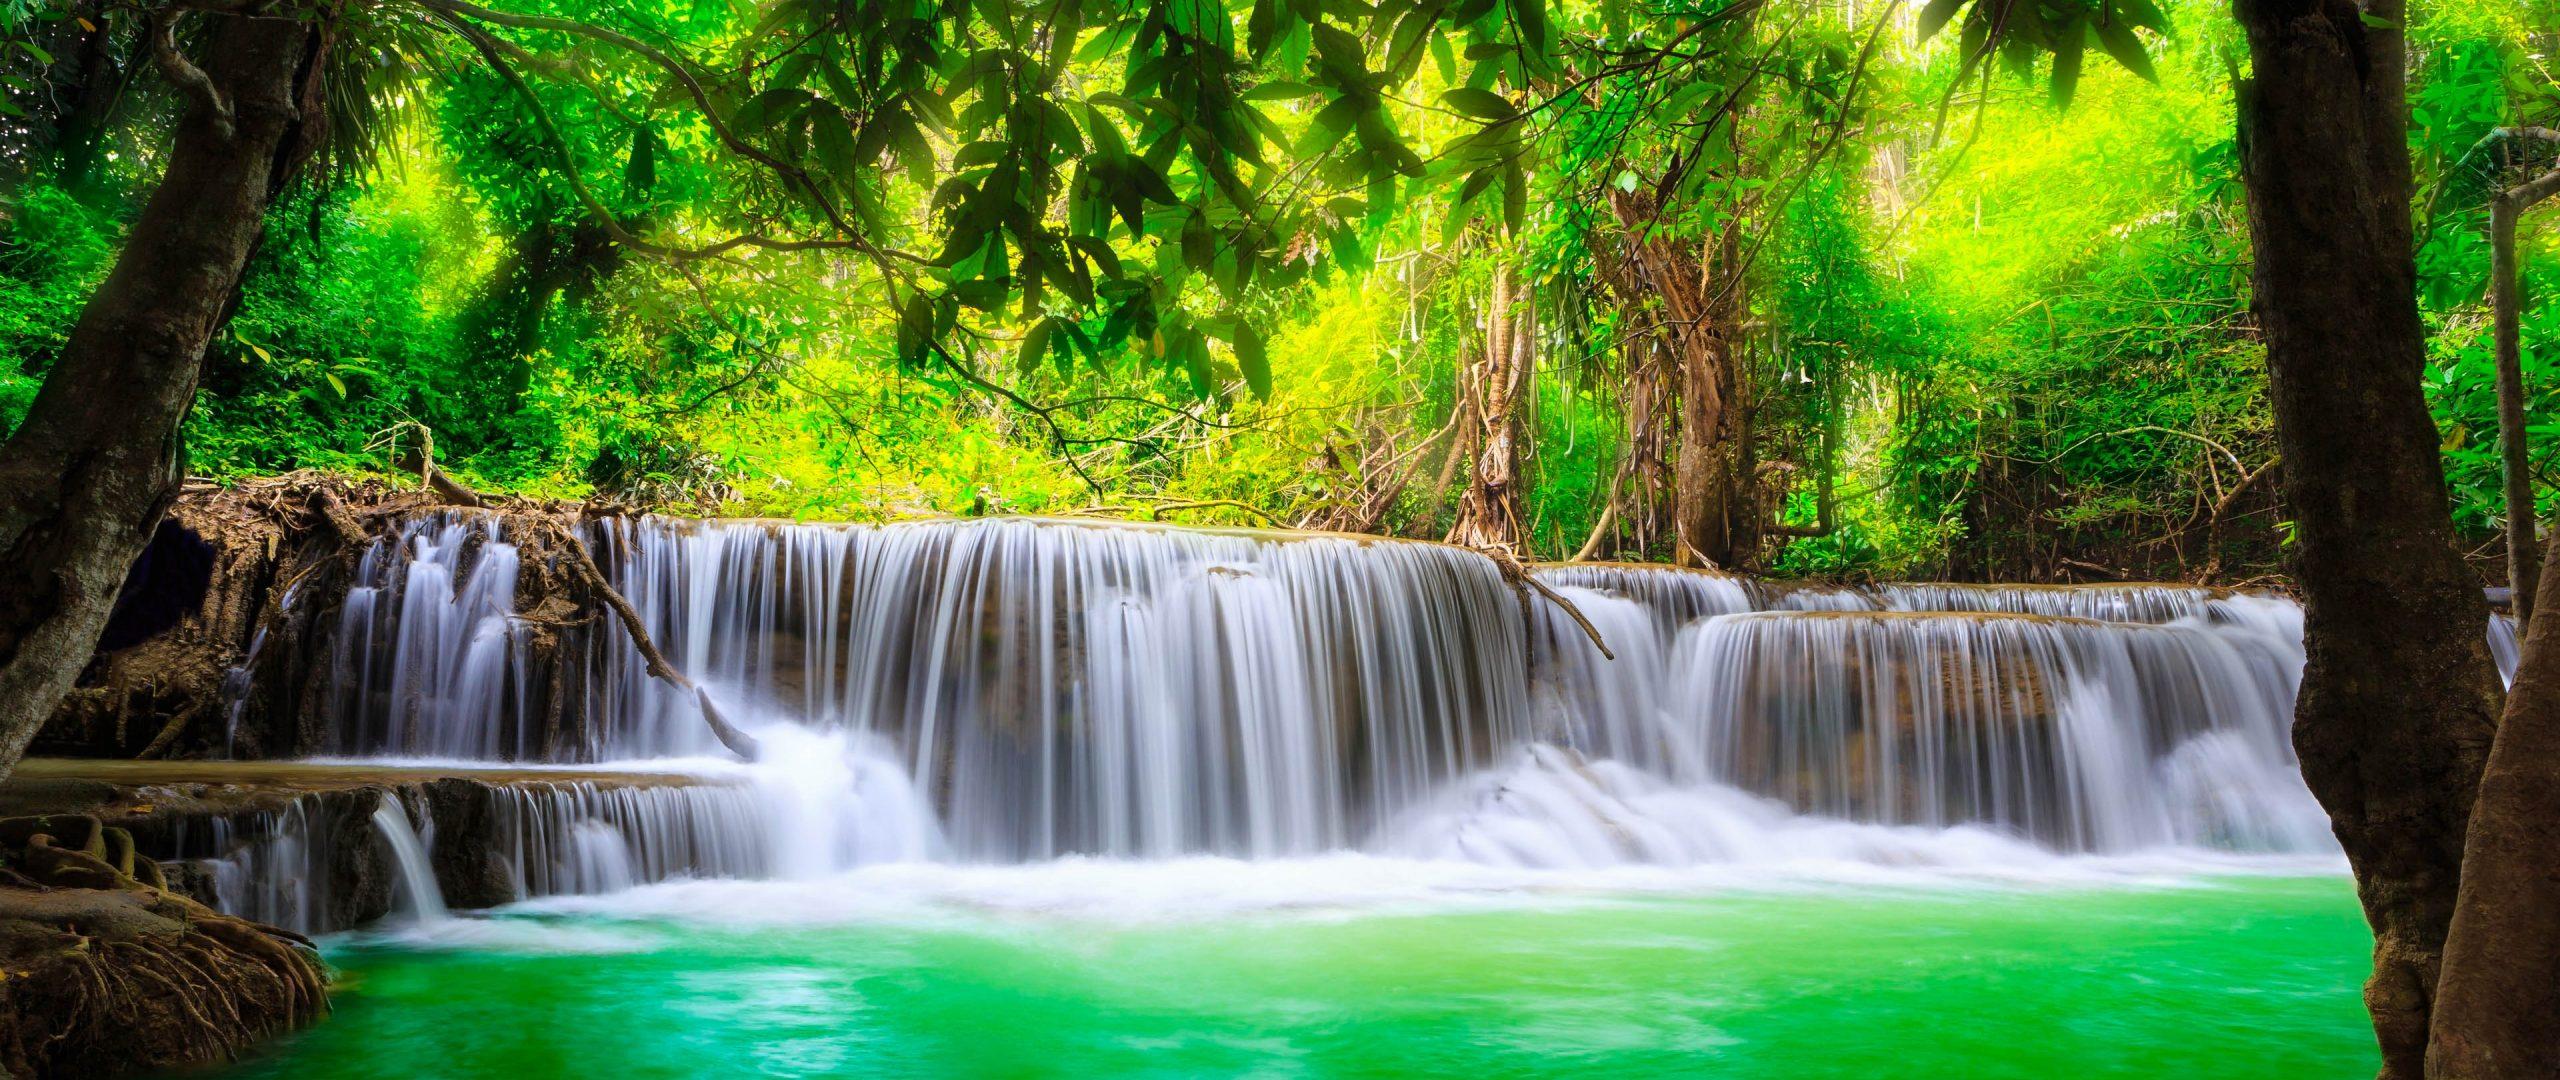 Nature Trees Waterfall Water Green River 4K Wallpaper ...